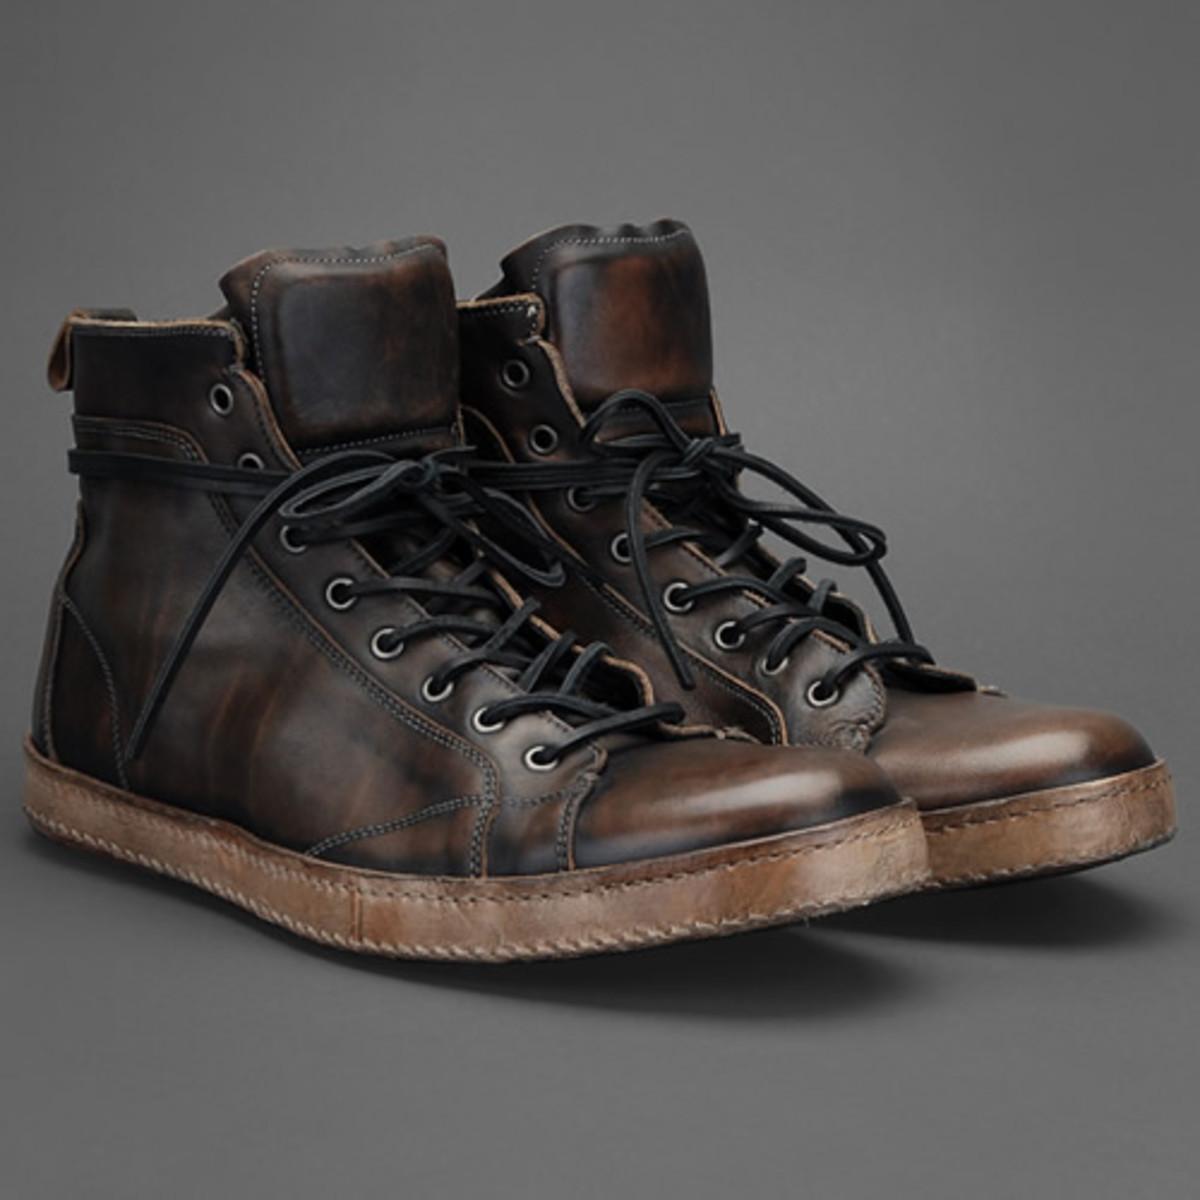 jvsneakers